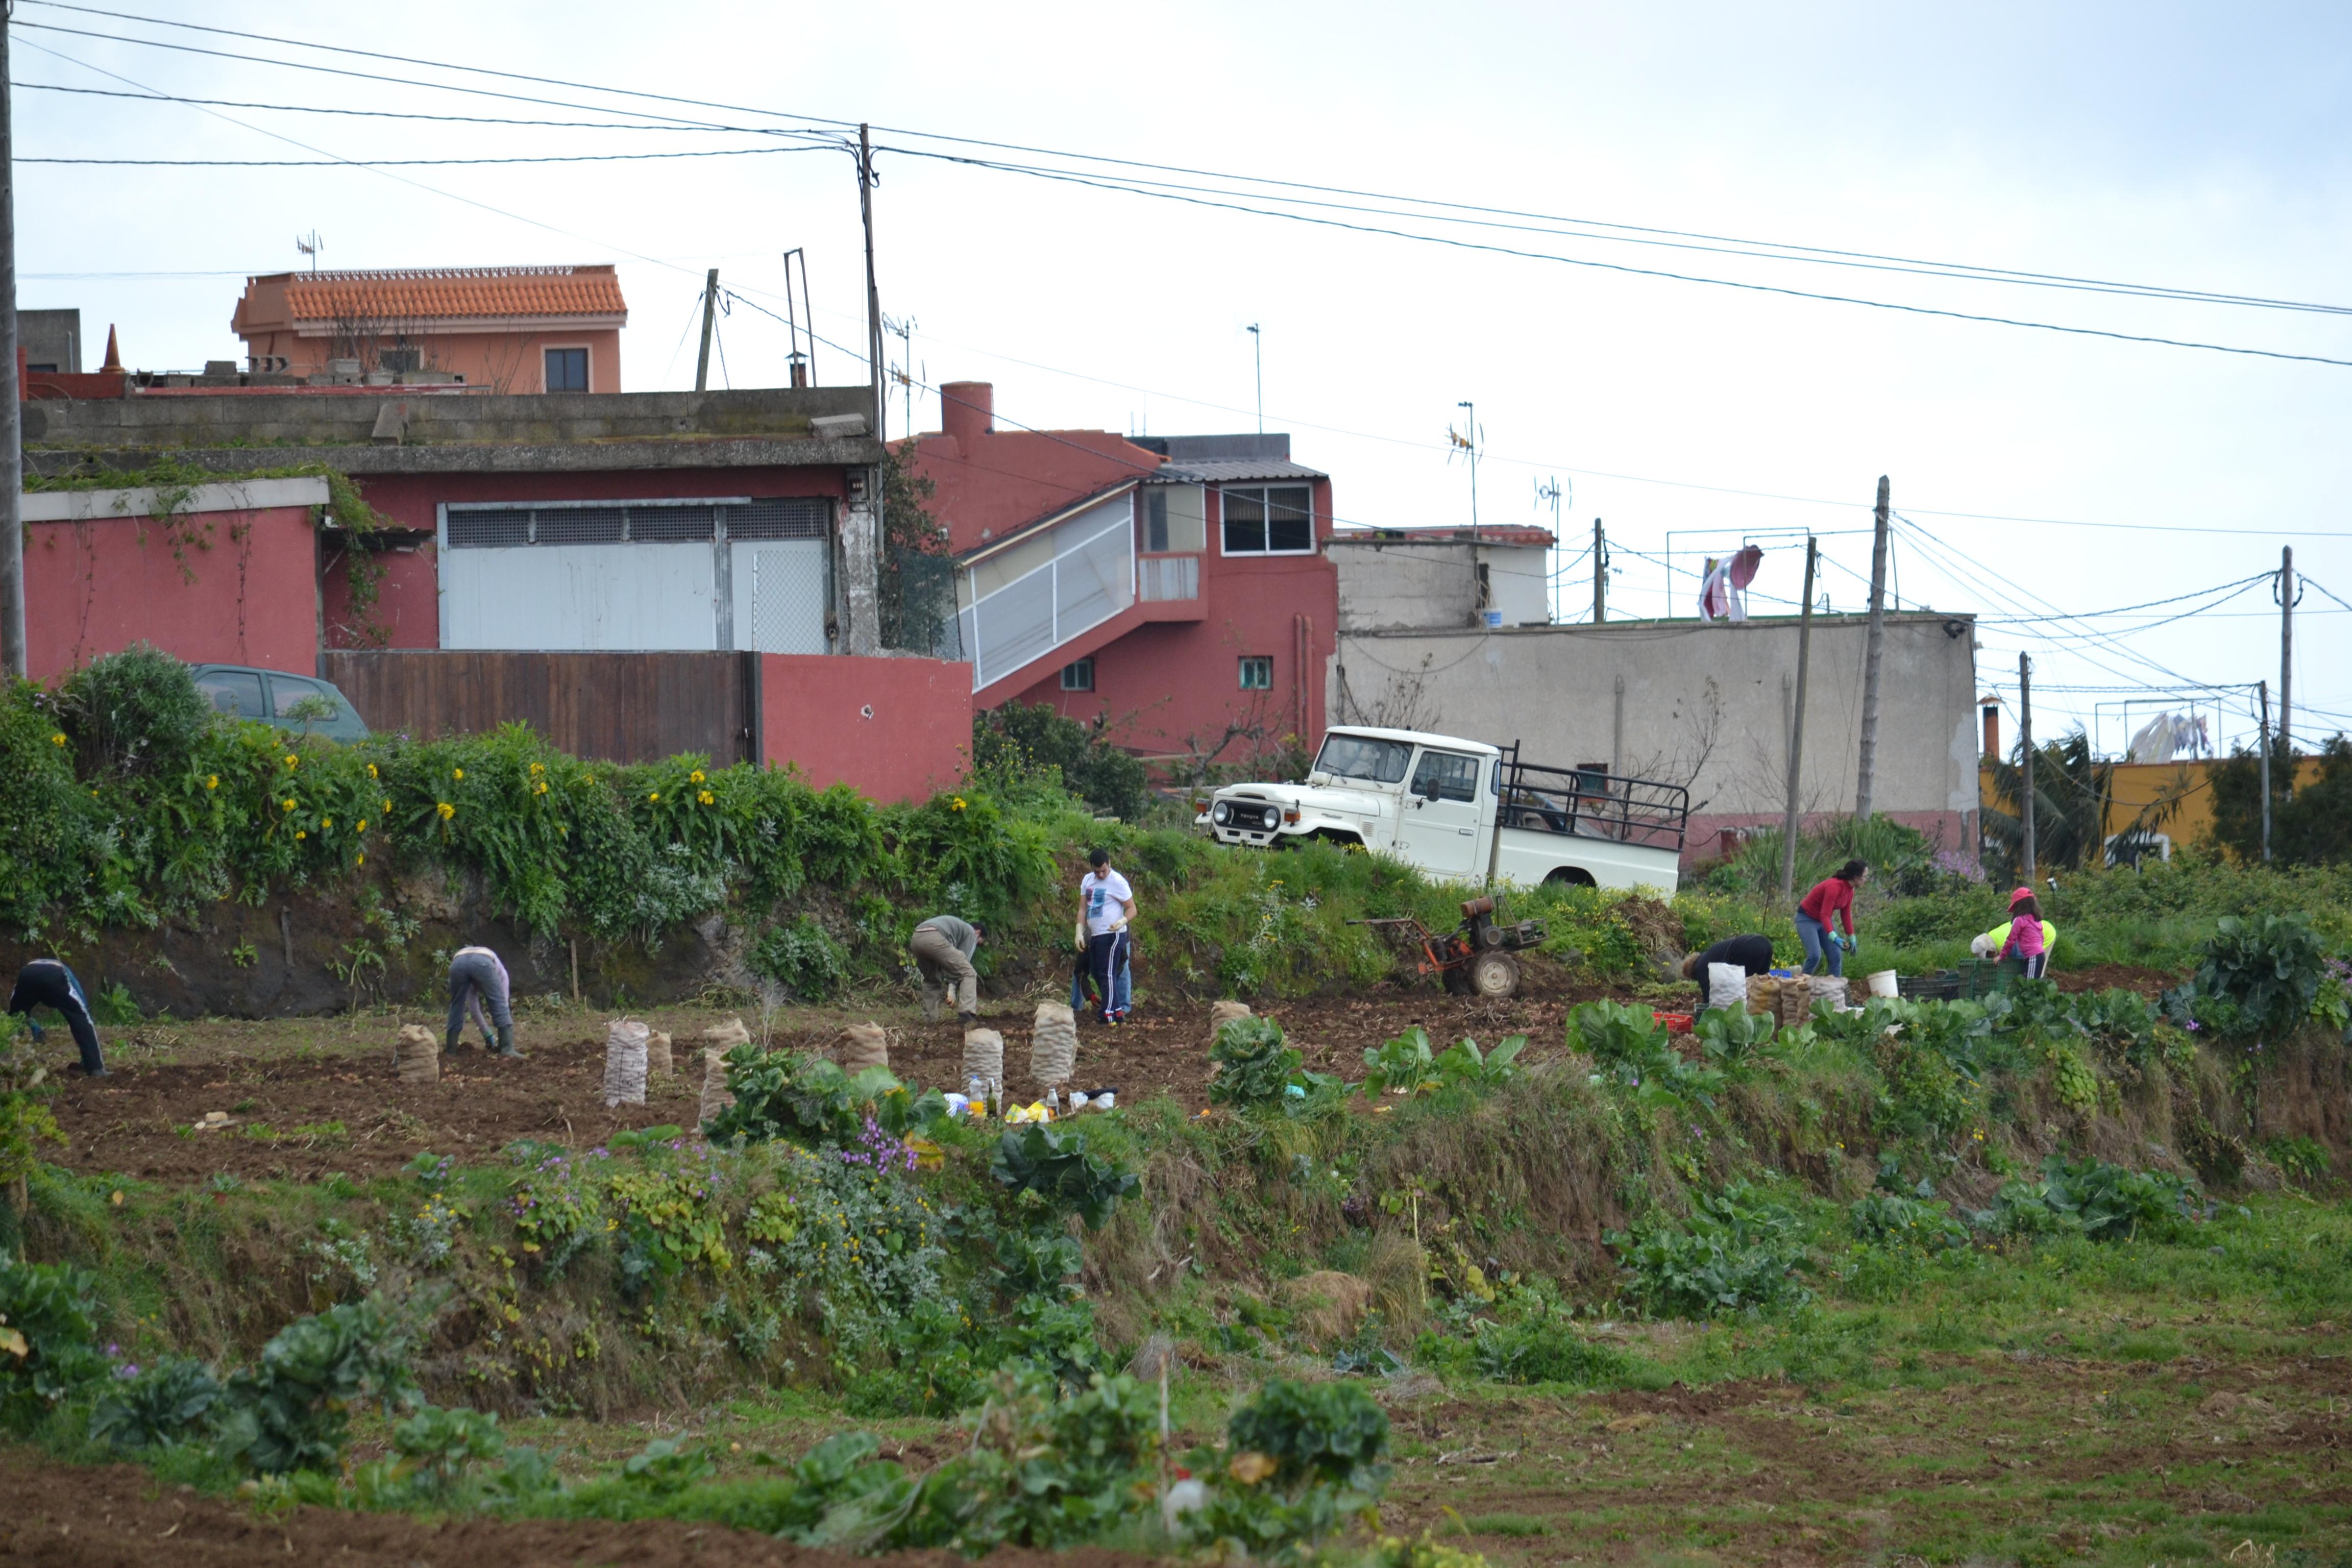 Tenerife kevad - kartulipanek